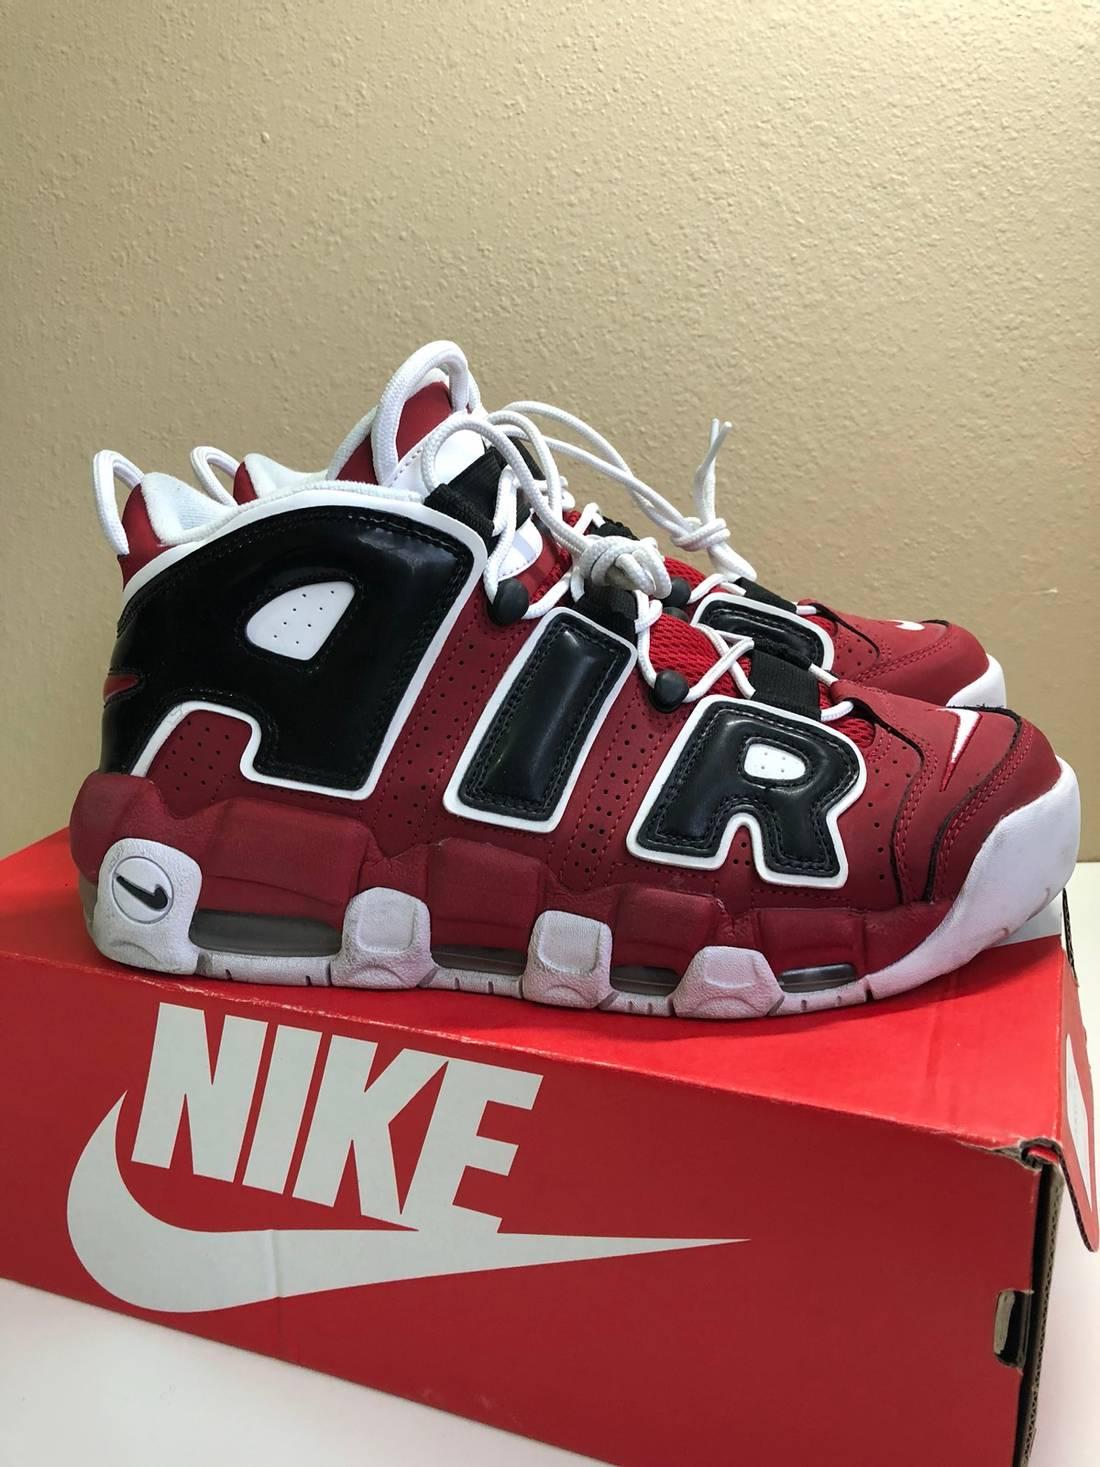 Nike Nike Uptempo Bulls Pack (Christmas) Size 8.5 - Hi-Top Sneakers ...